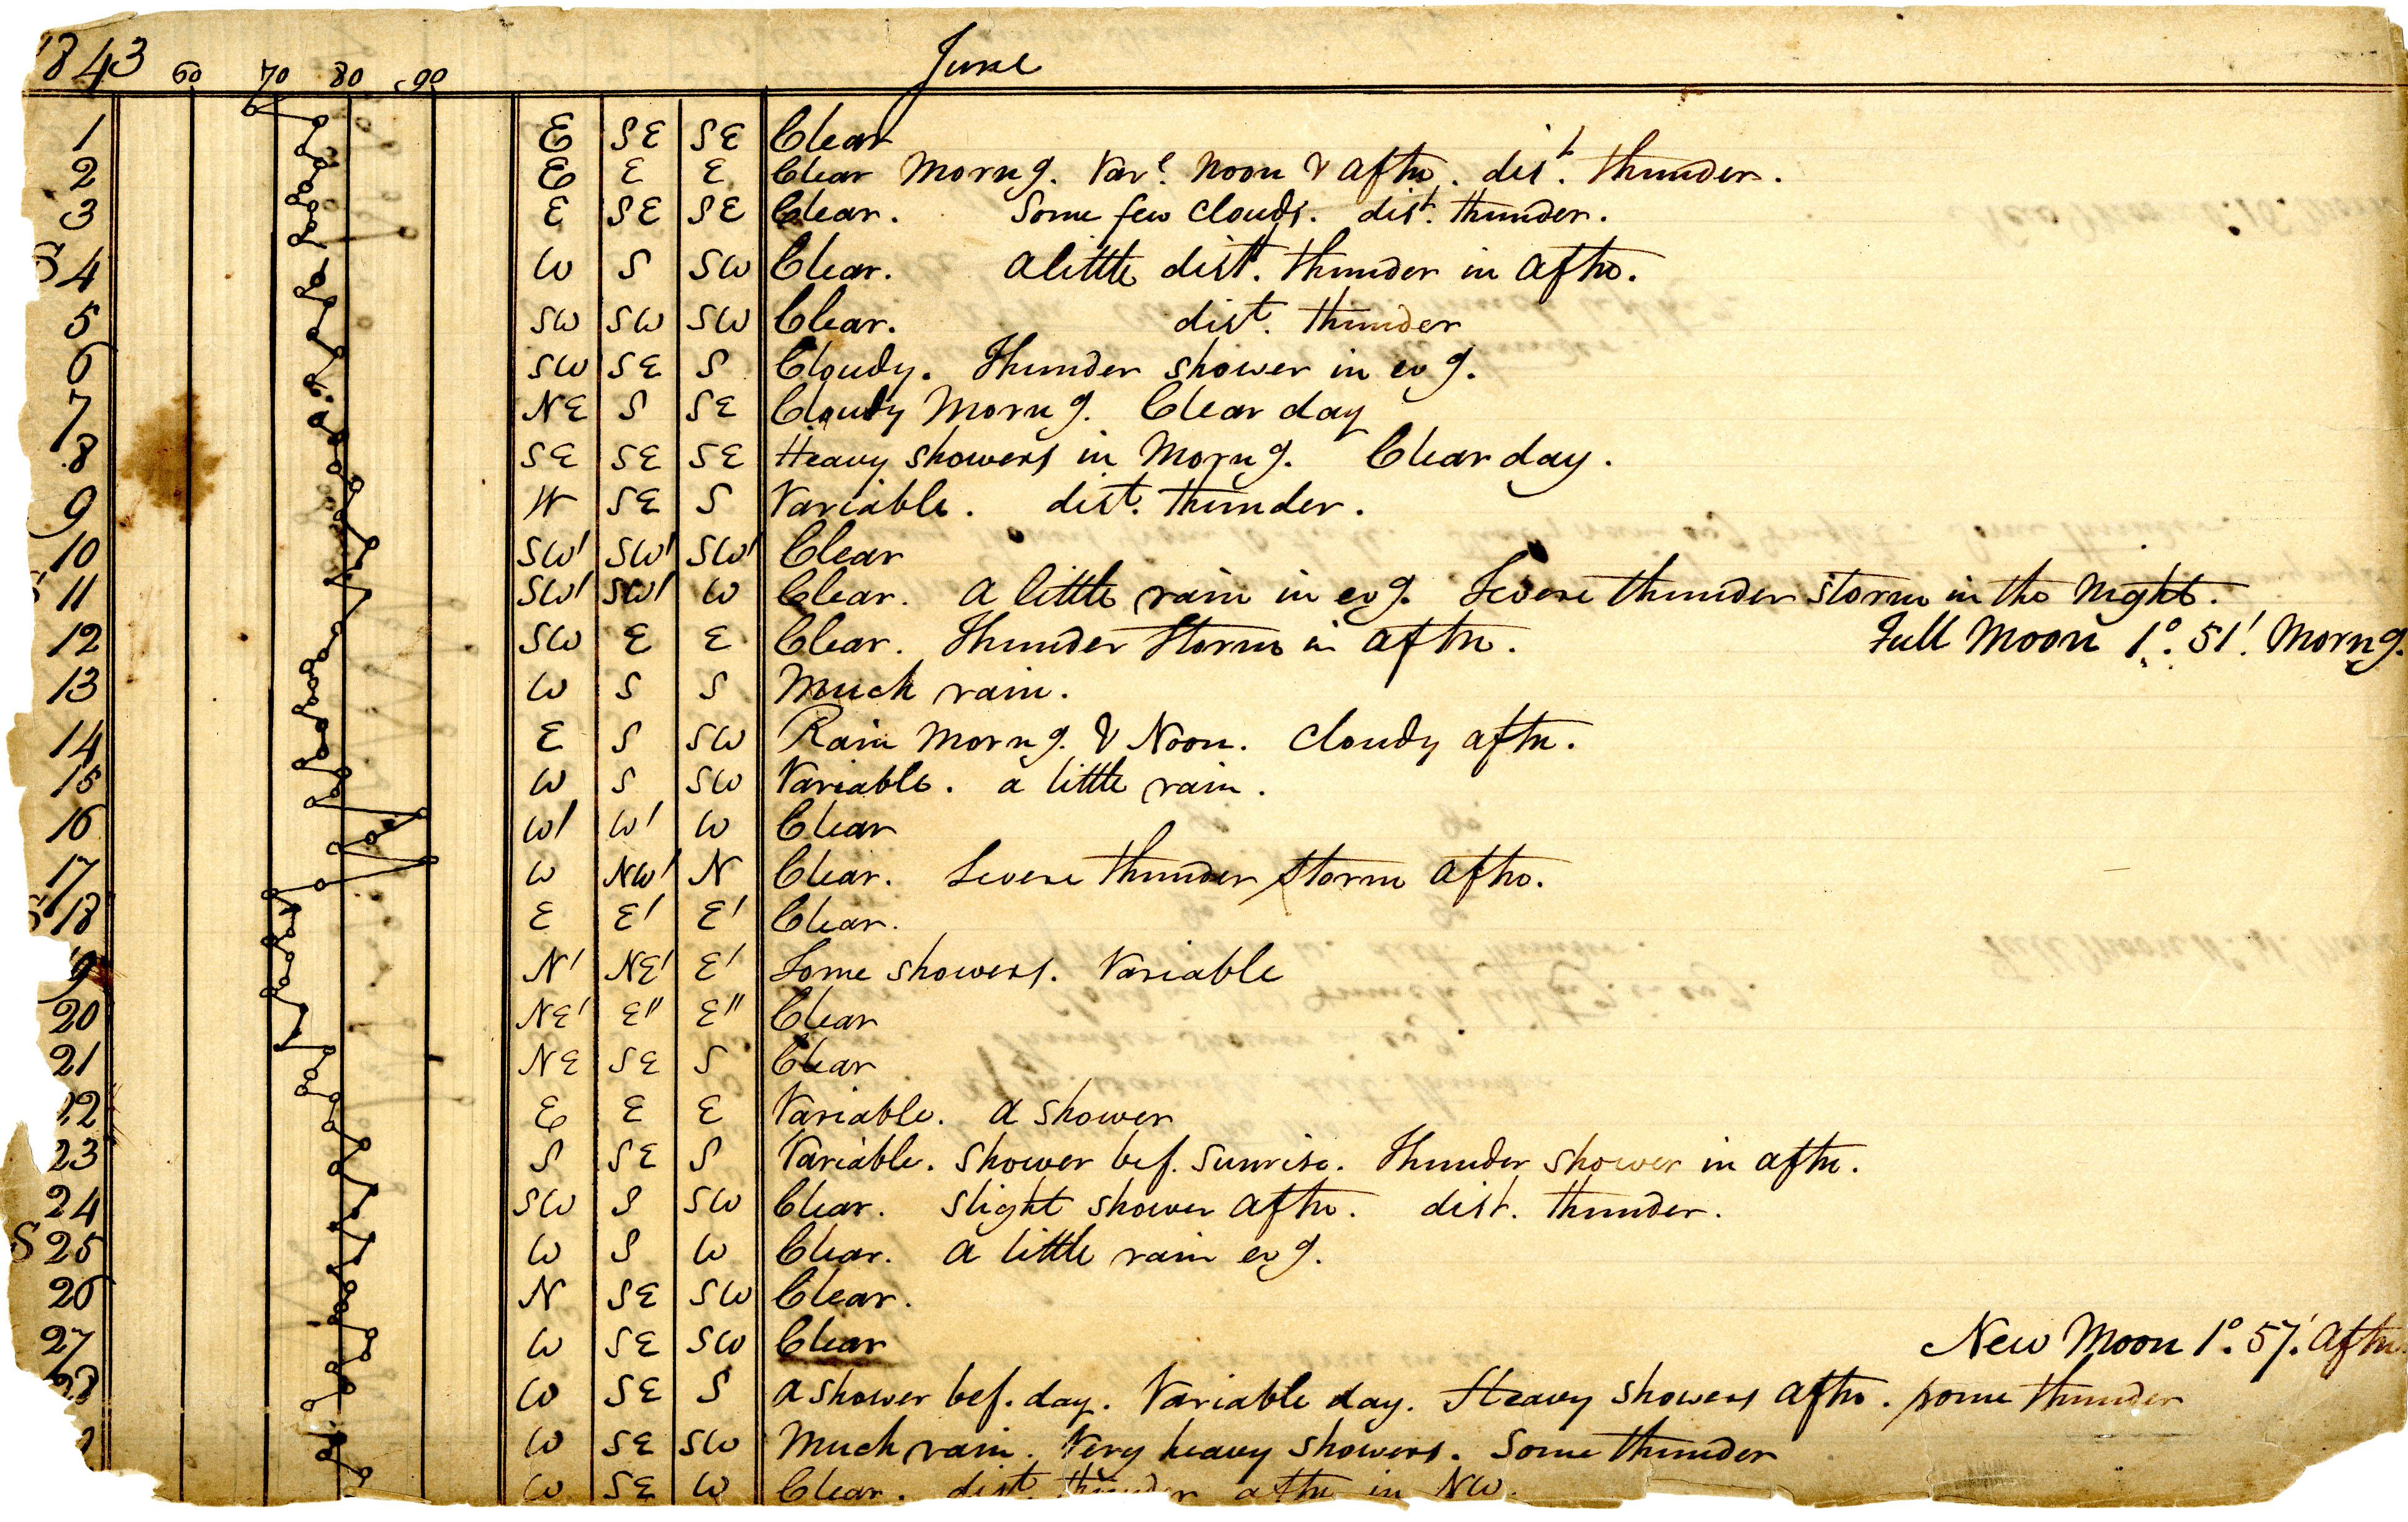 Volume 1: Daily Meteorological Observations, June 1843